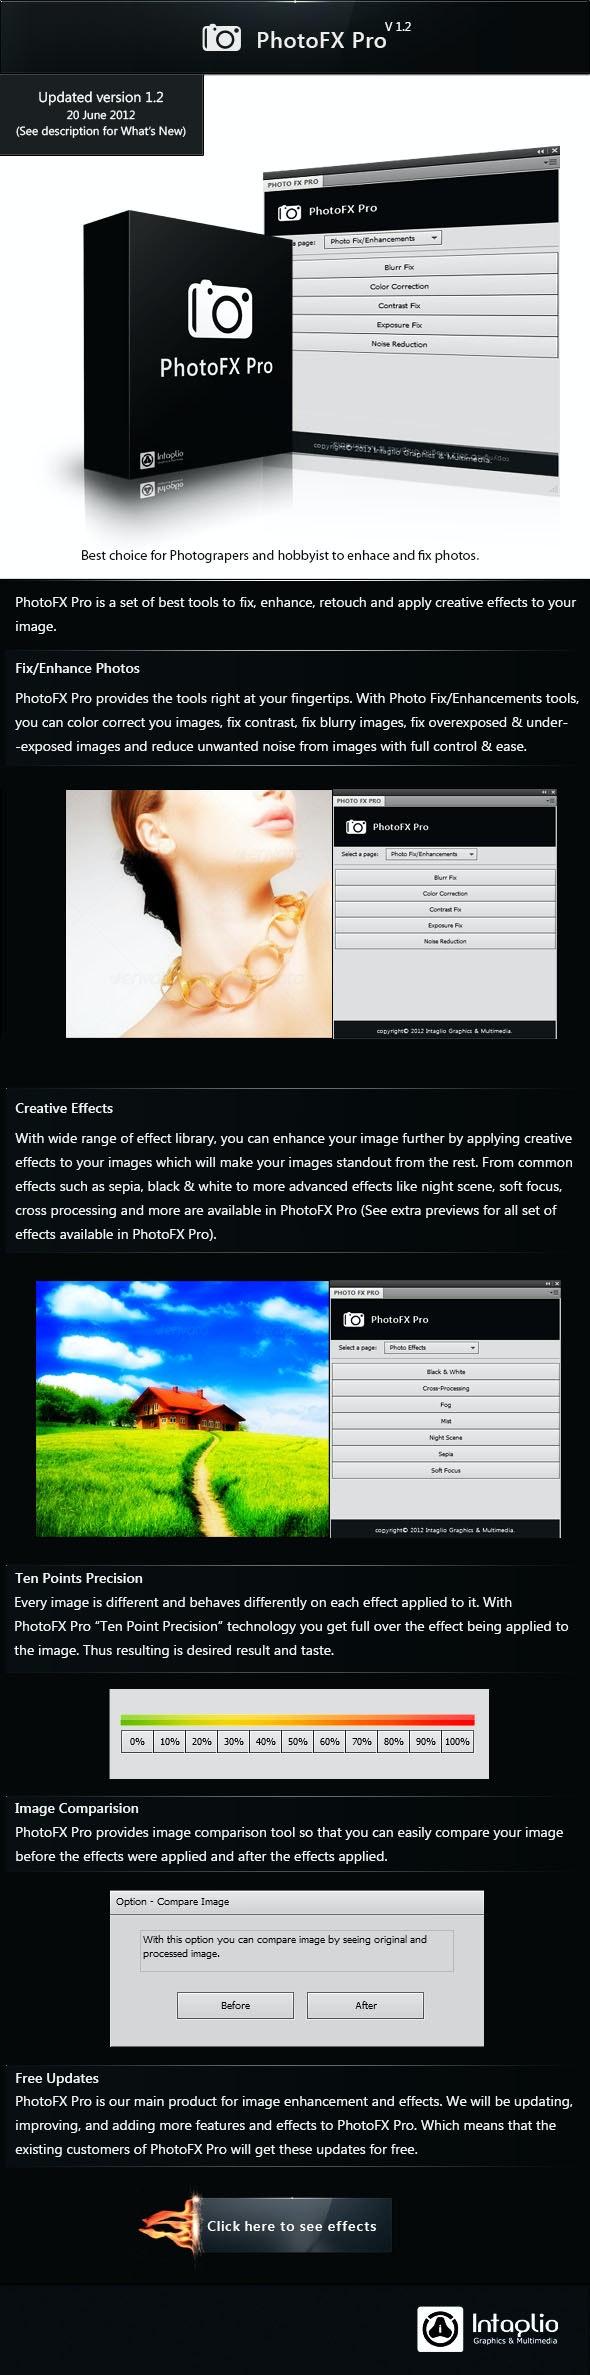 PhotoFX Pro - Photoshop Add-ons